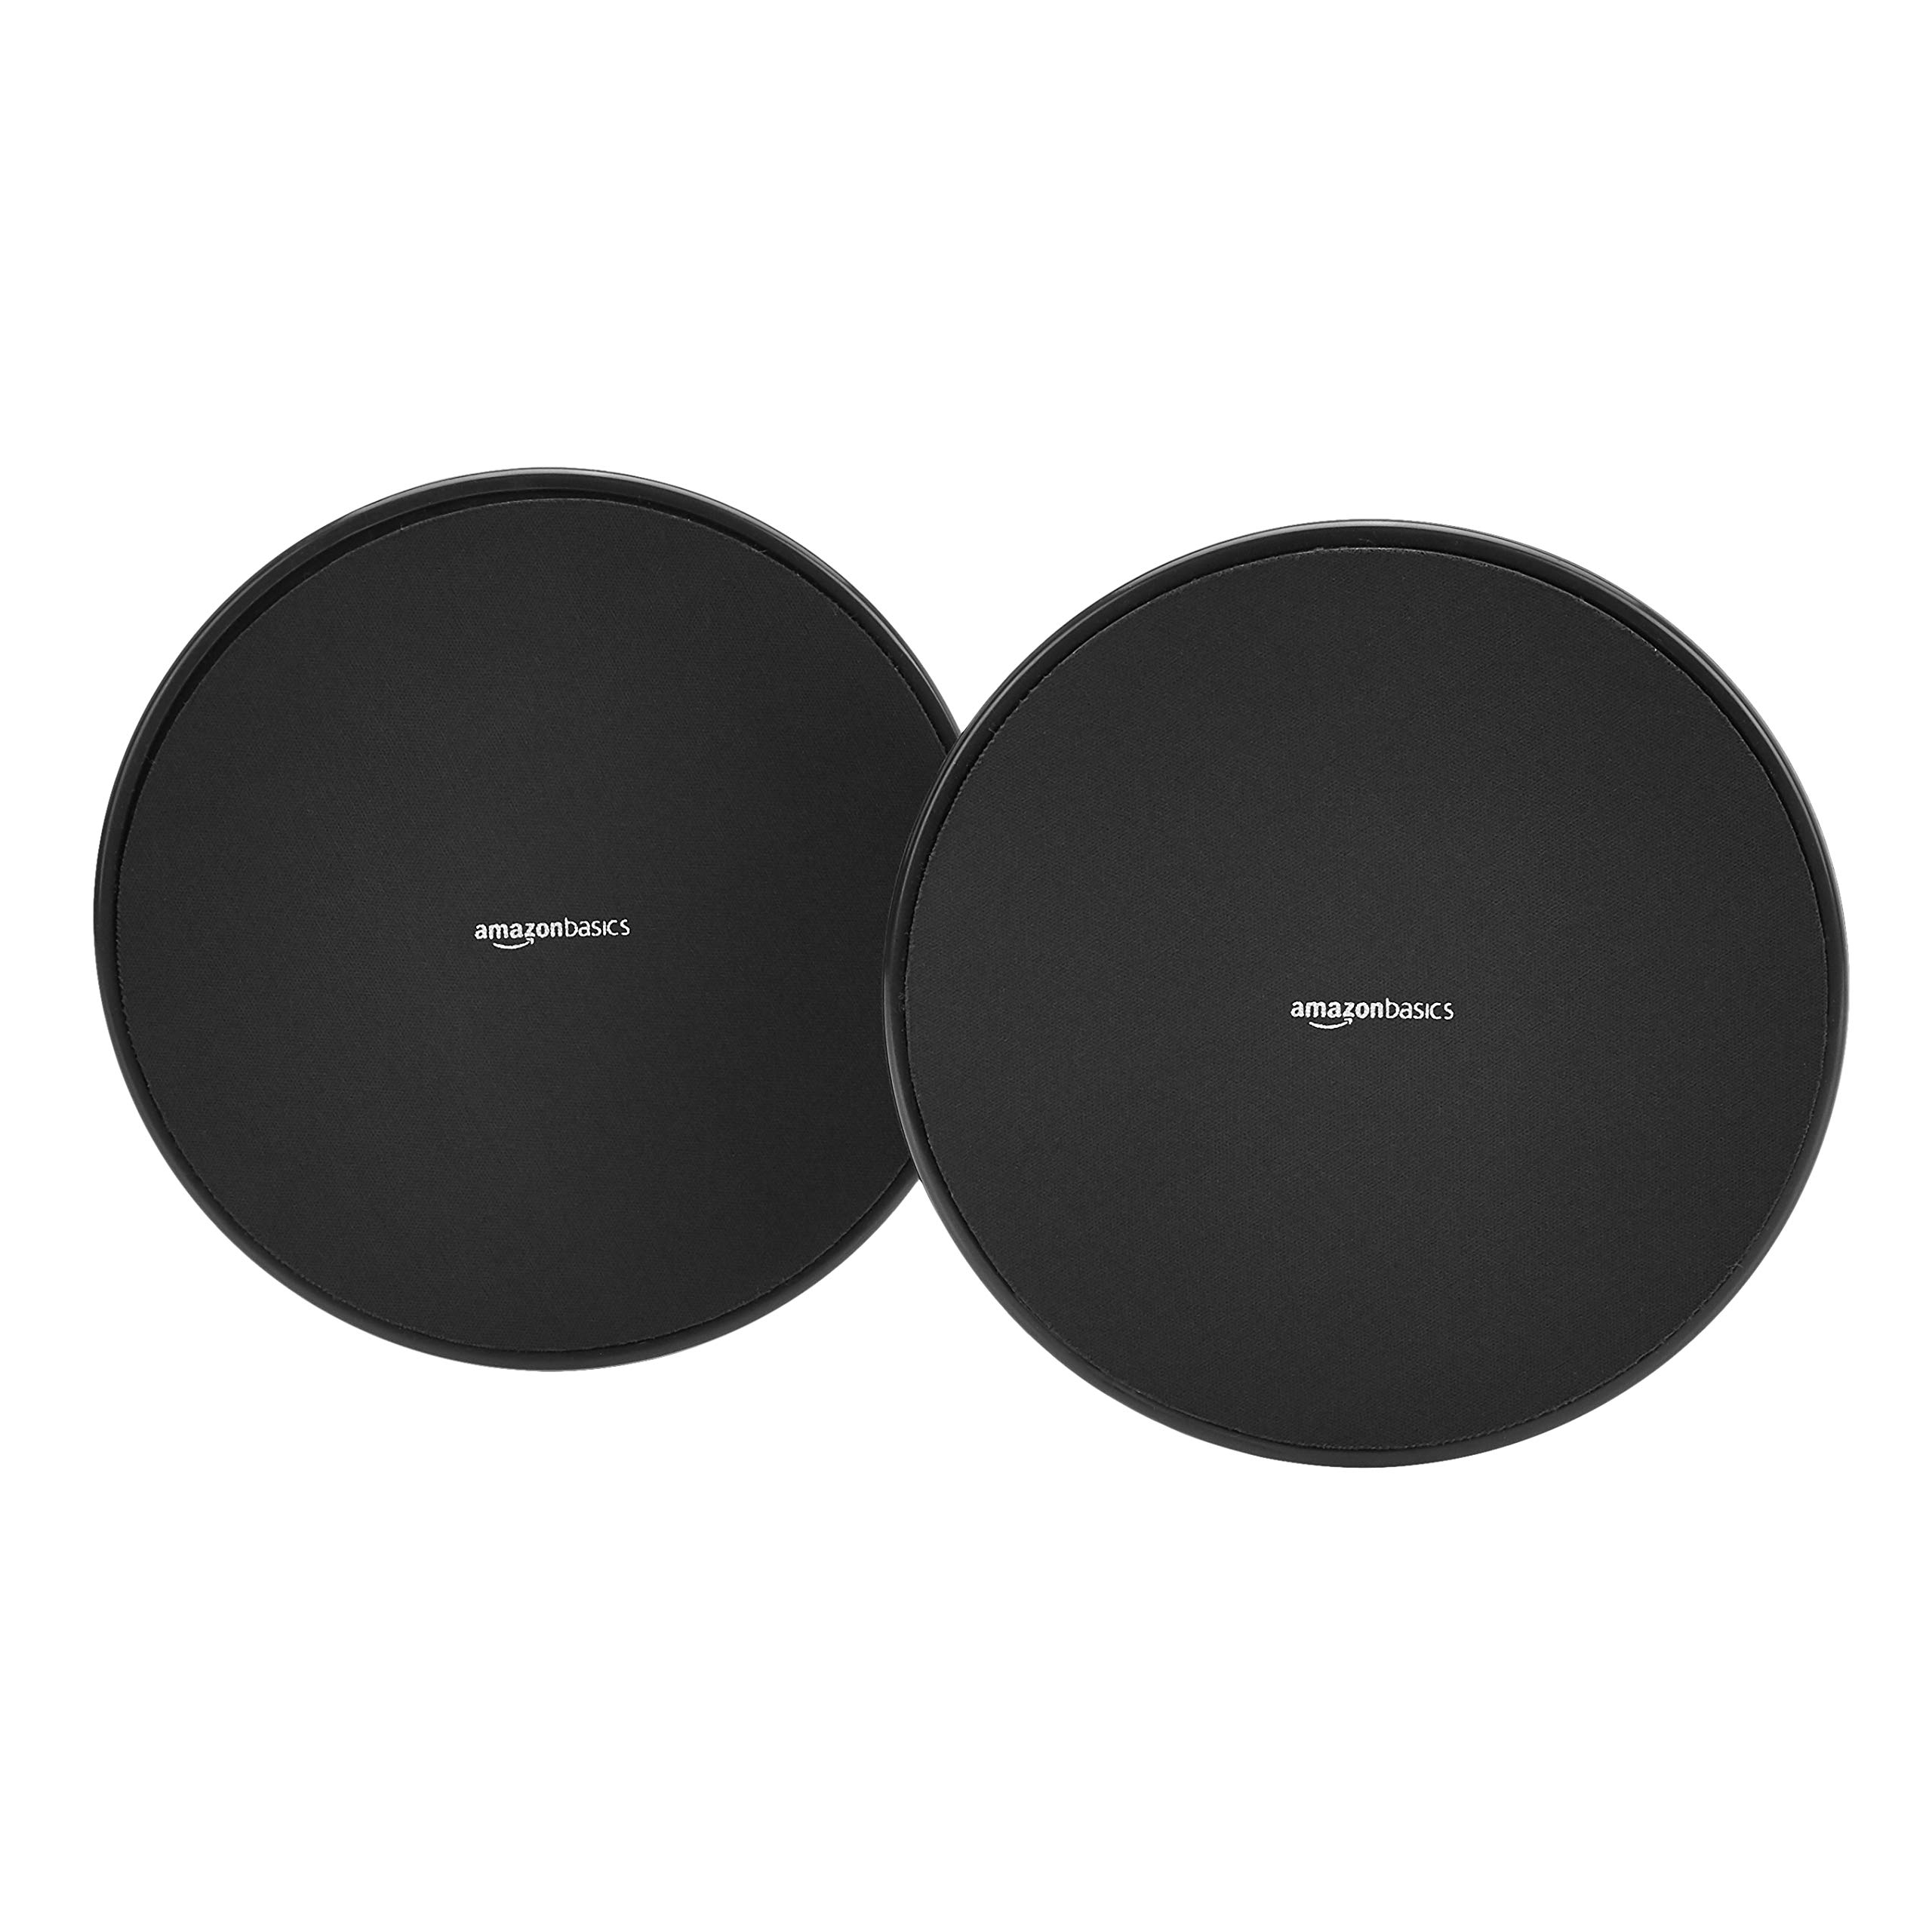 AmazonBasics Double Sided Core Exercise Gliding Sliders - 1-Pair